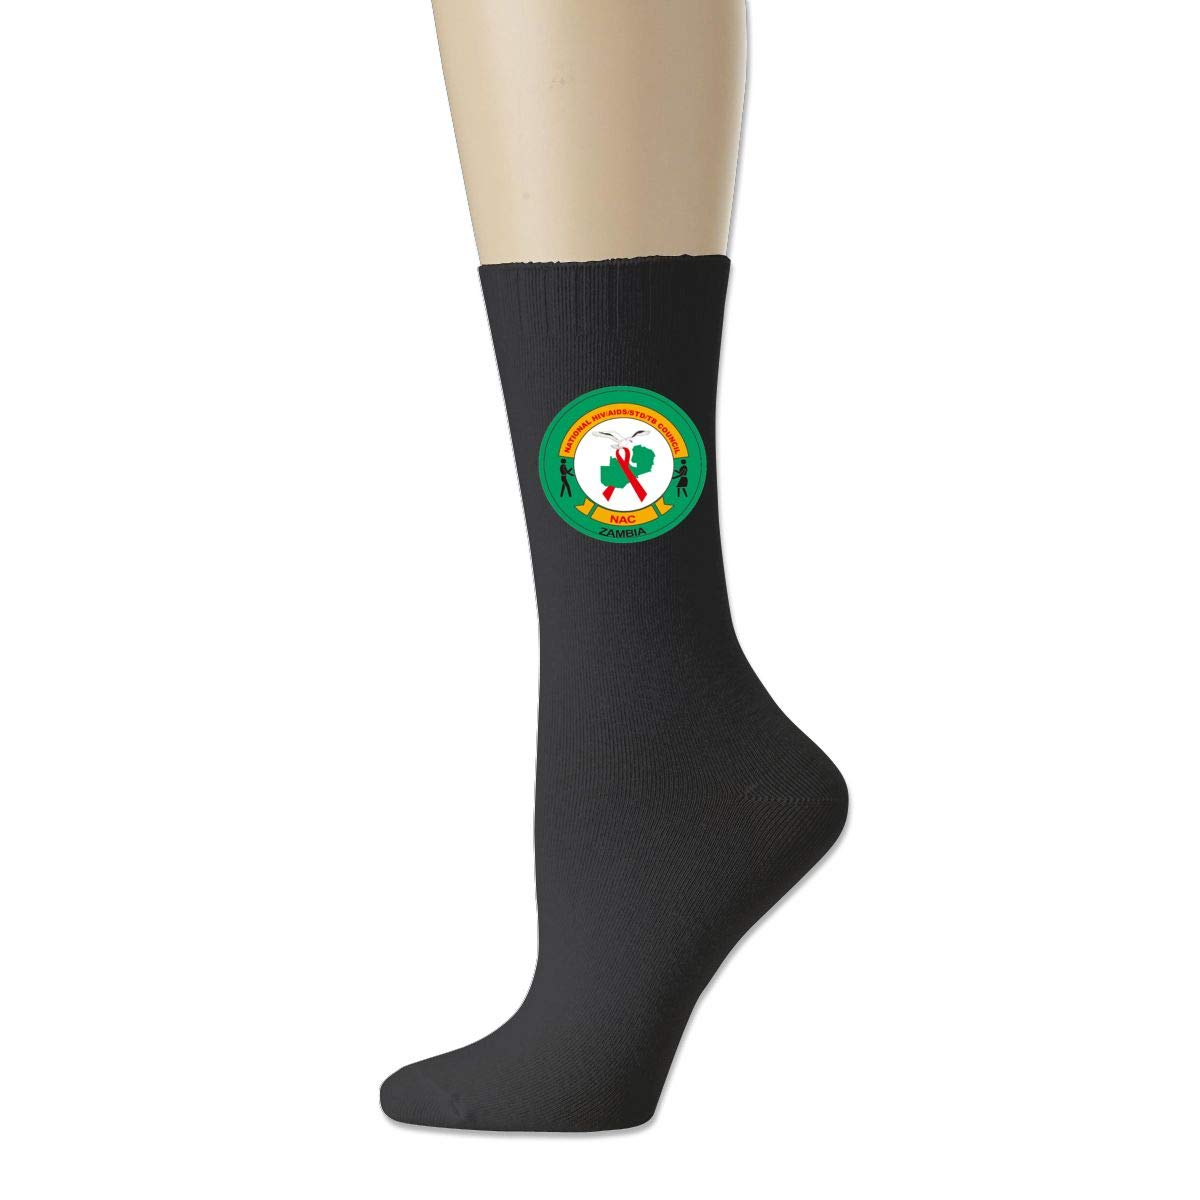 Rigg-socks Flag Of Zambia Mens Comfortable Sport Socks Black